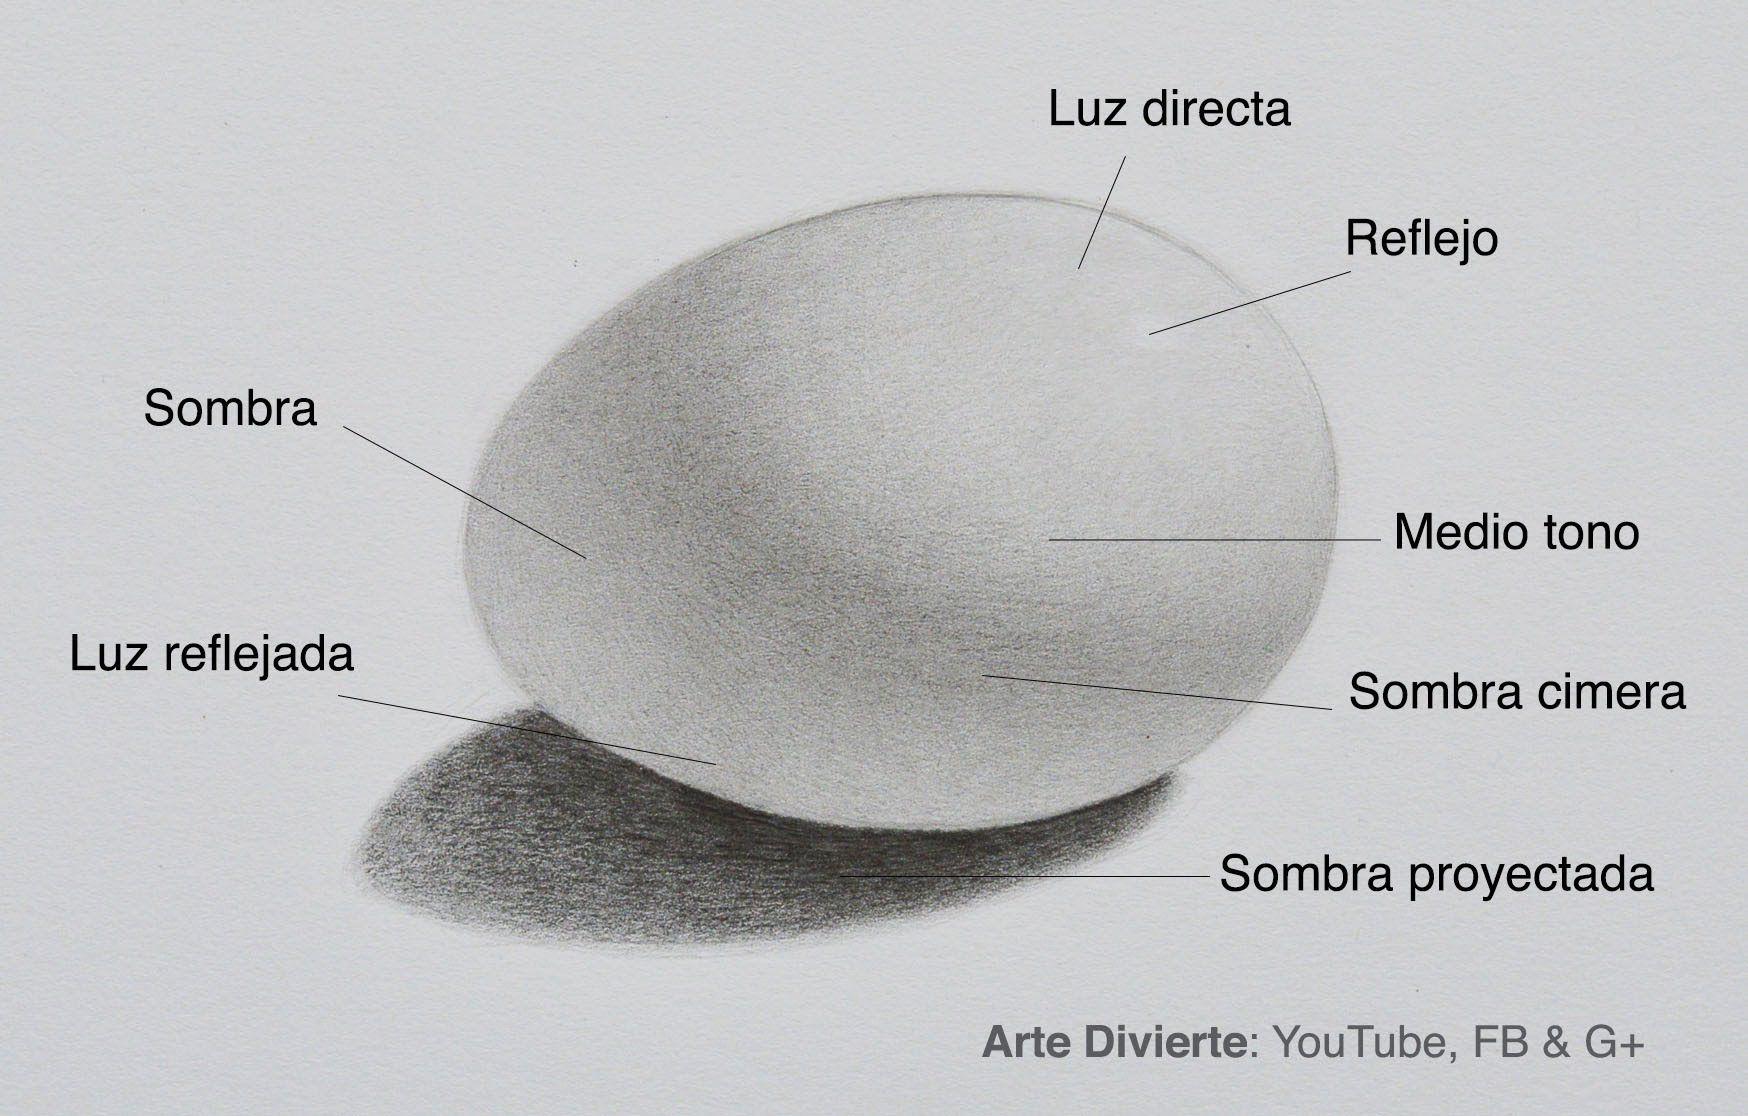 Como Dibujar Sombras Como Dibujar Un Huevo Como Dibujar Sombras Luz Y Sombra Dibujo Luz Y Sombra